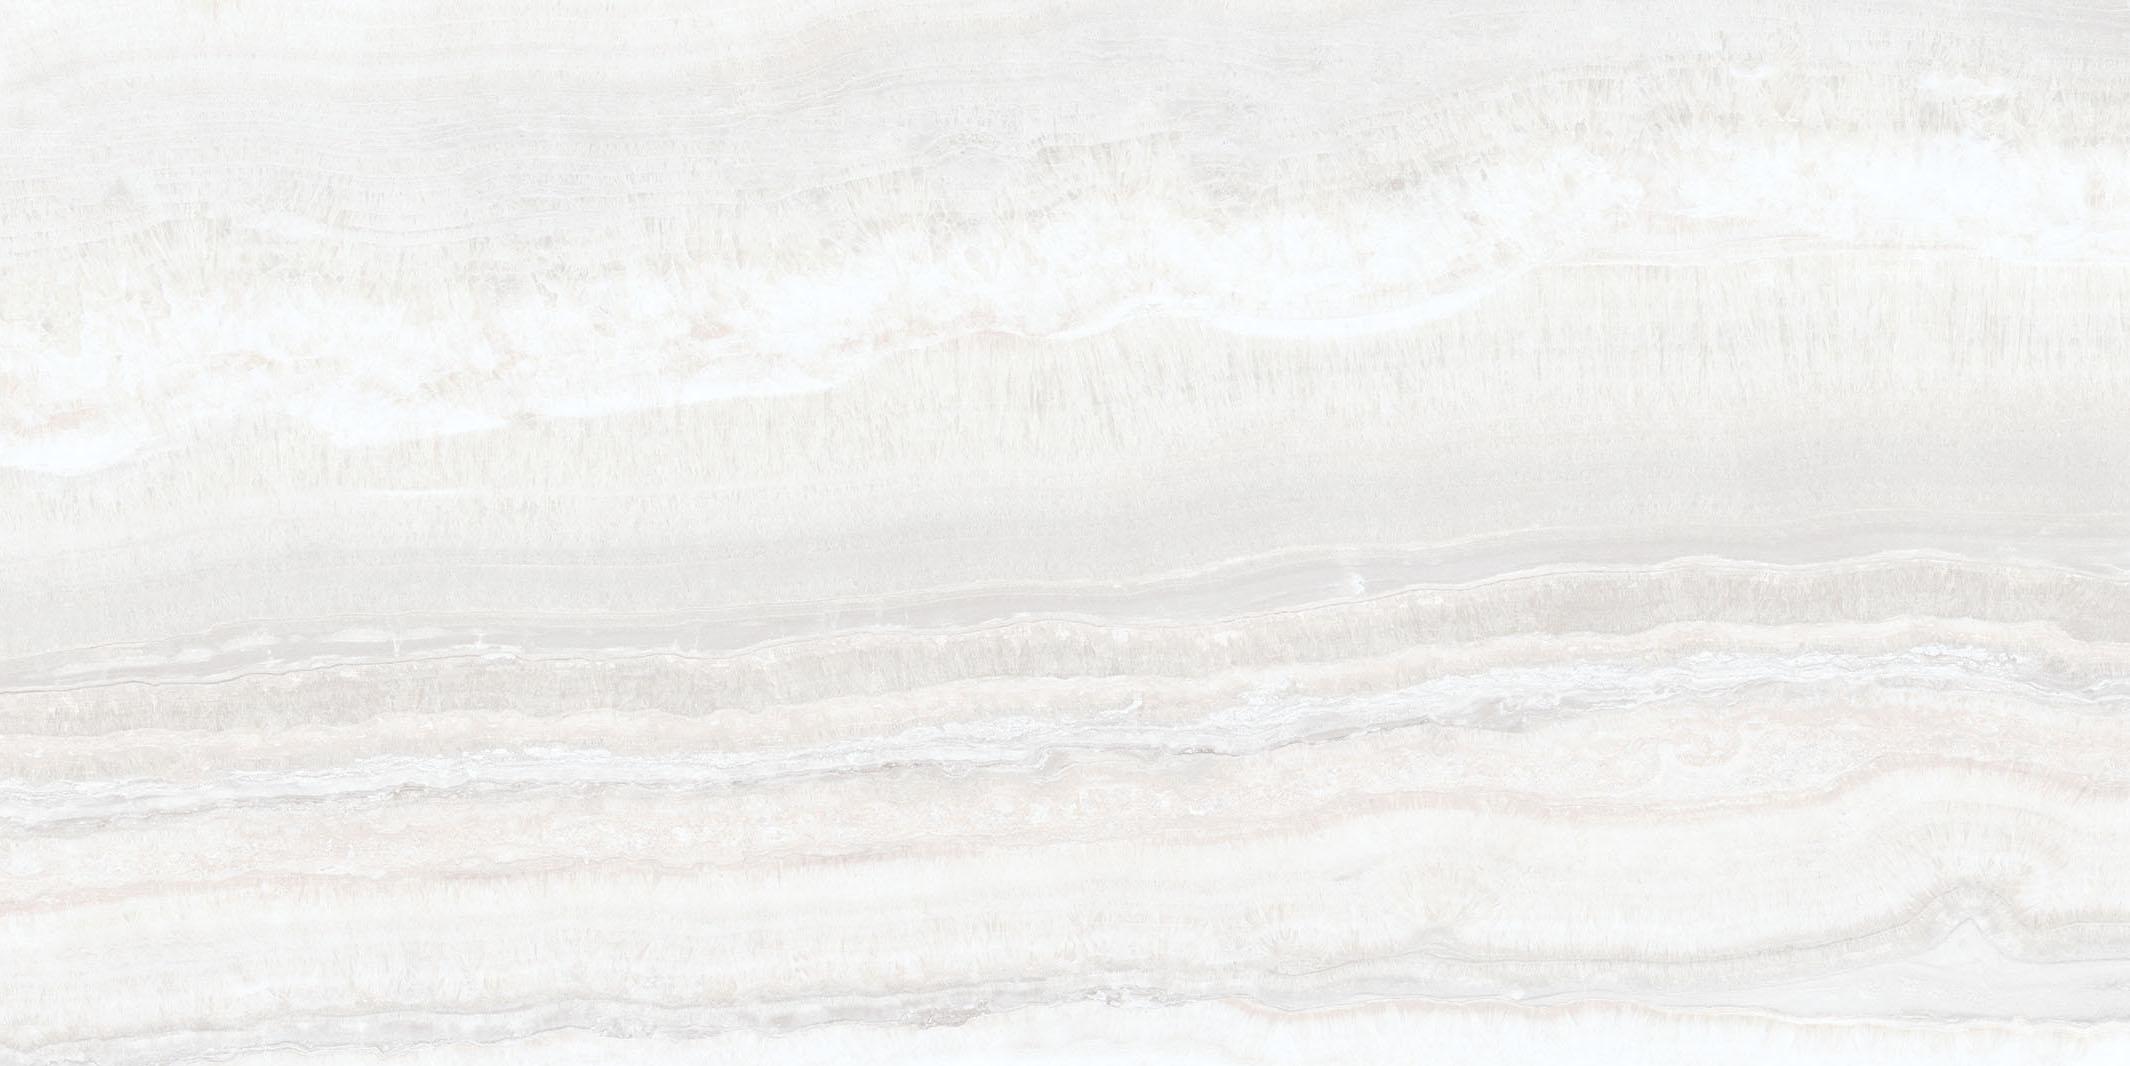 Onyx of Cerim White Matte 10mm 60 x 120